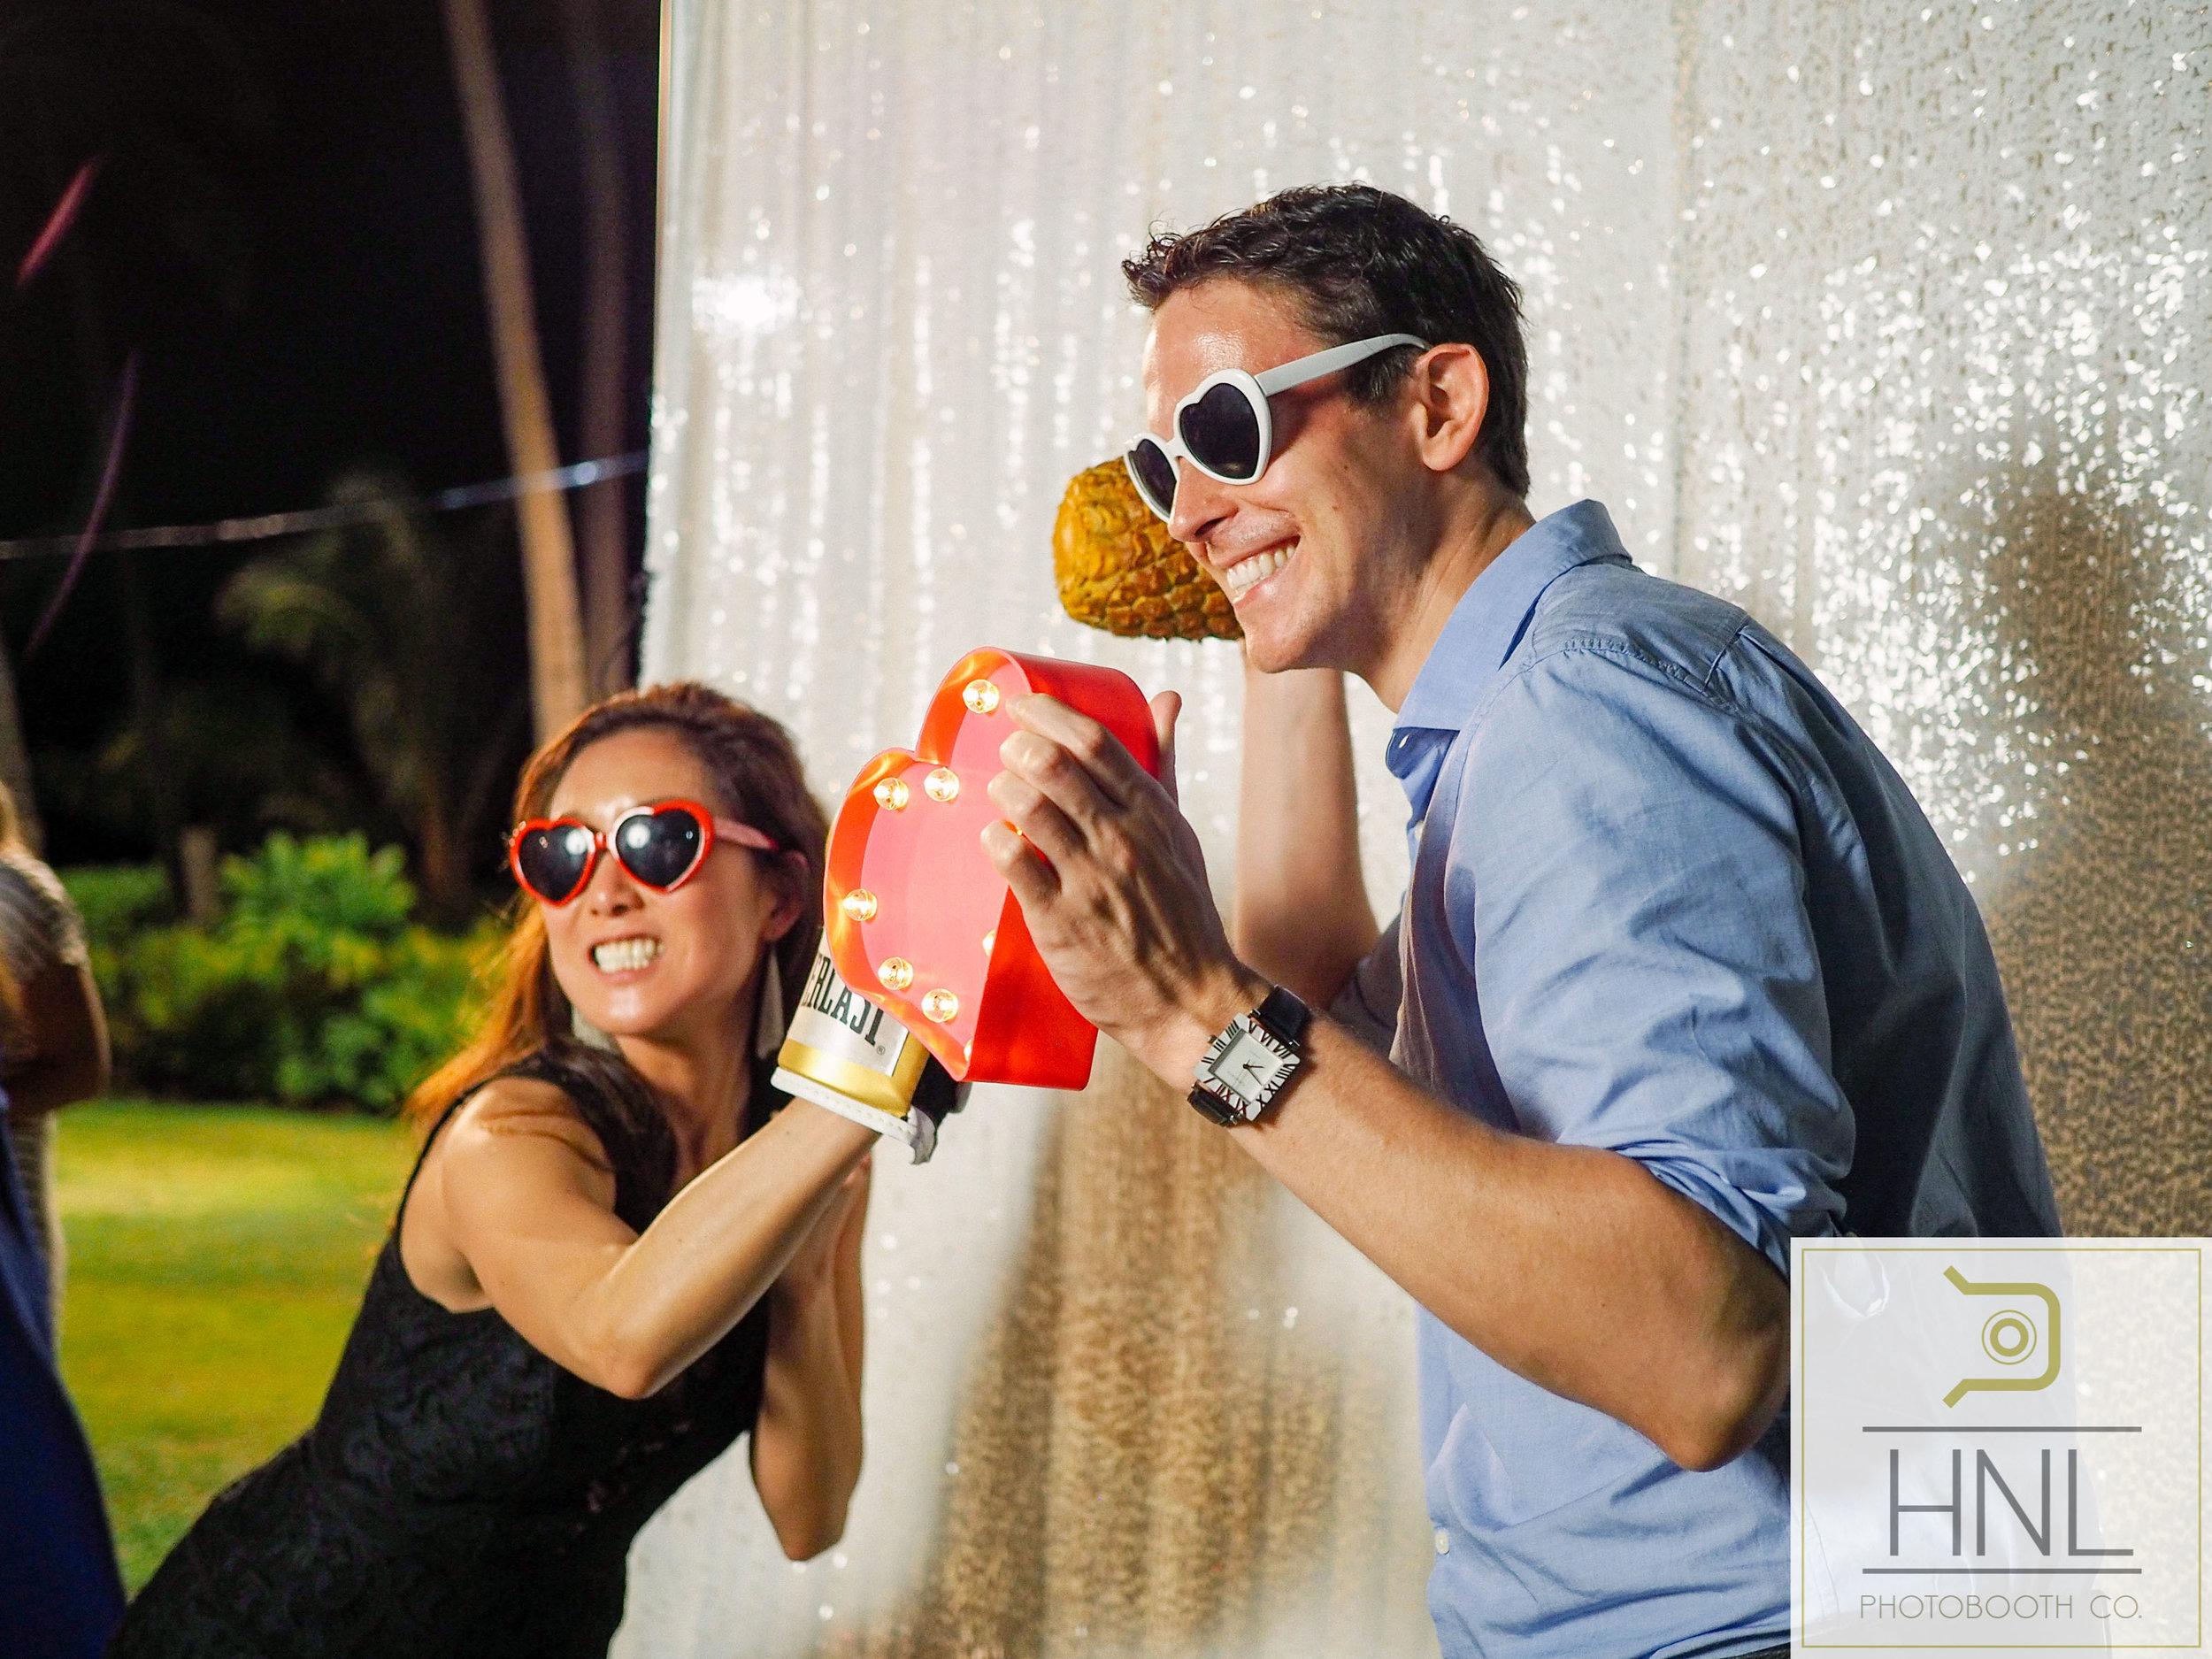 Miki and Dan wedding photo booth lanikohonua ko olina kapolei Oahu Hawaii -122.jpg